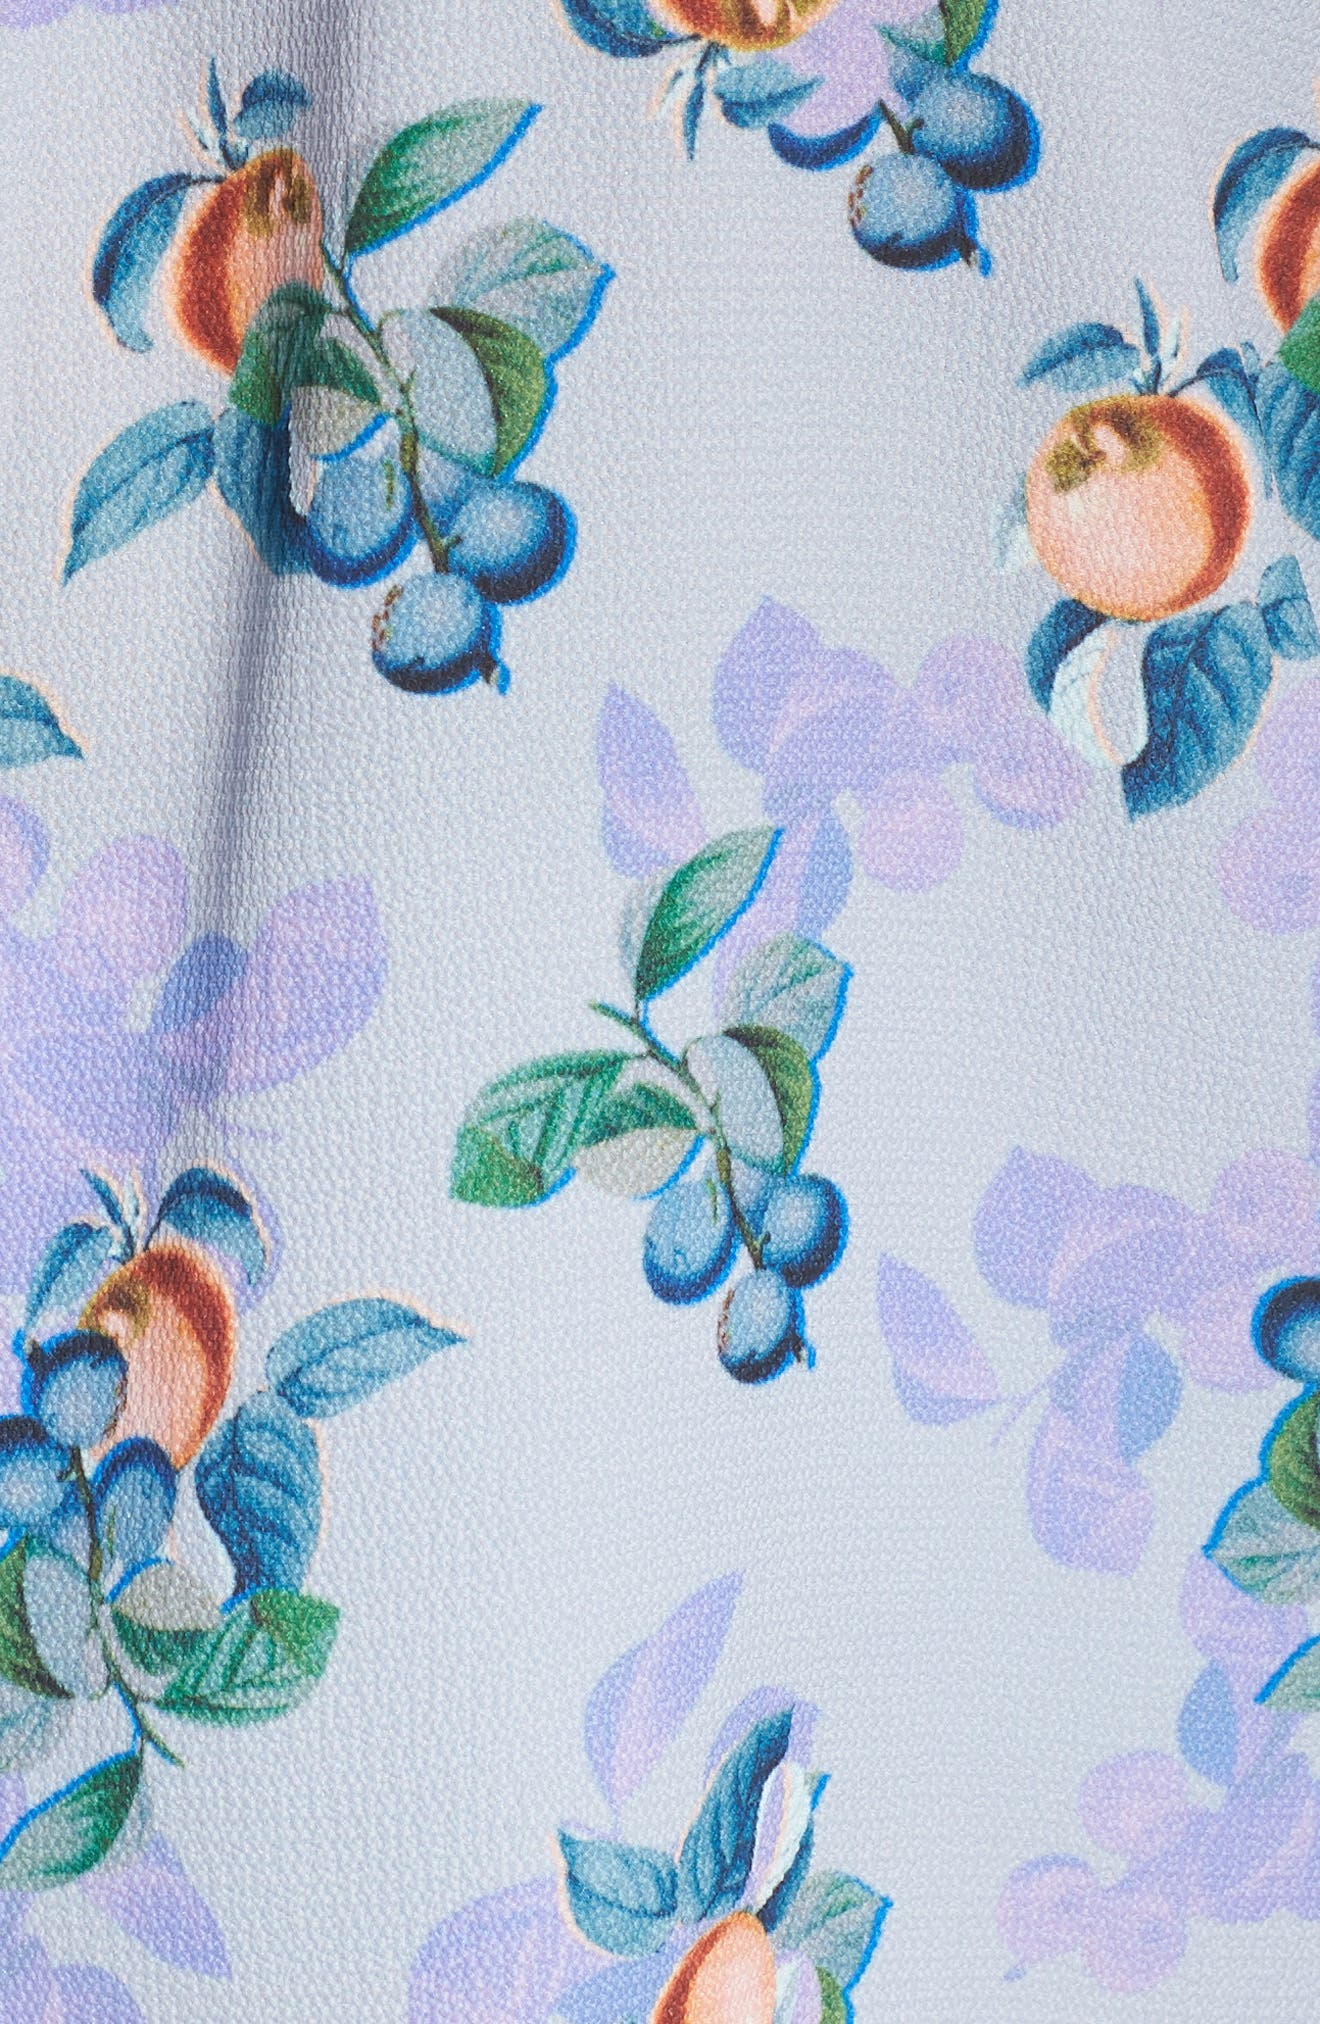 Peach Print Blouse,                             Alternate thumbnail 6, color,                             460